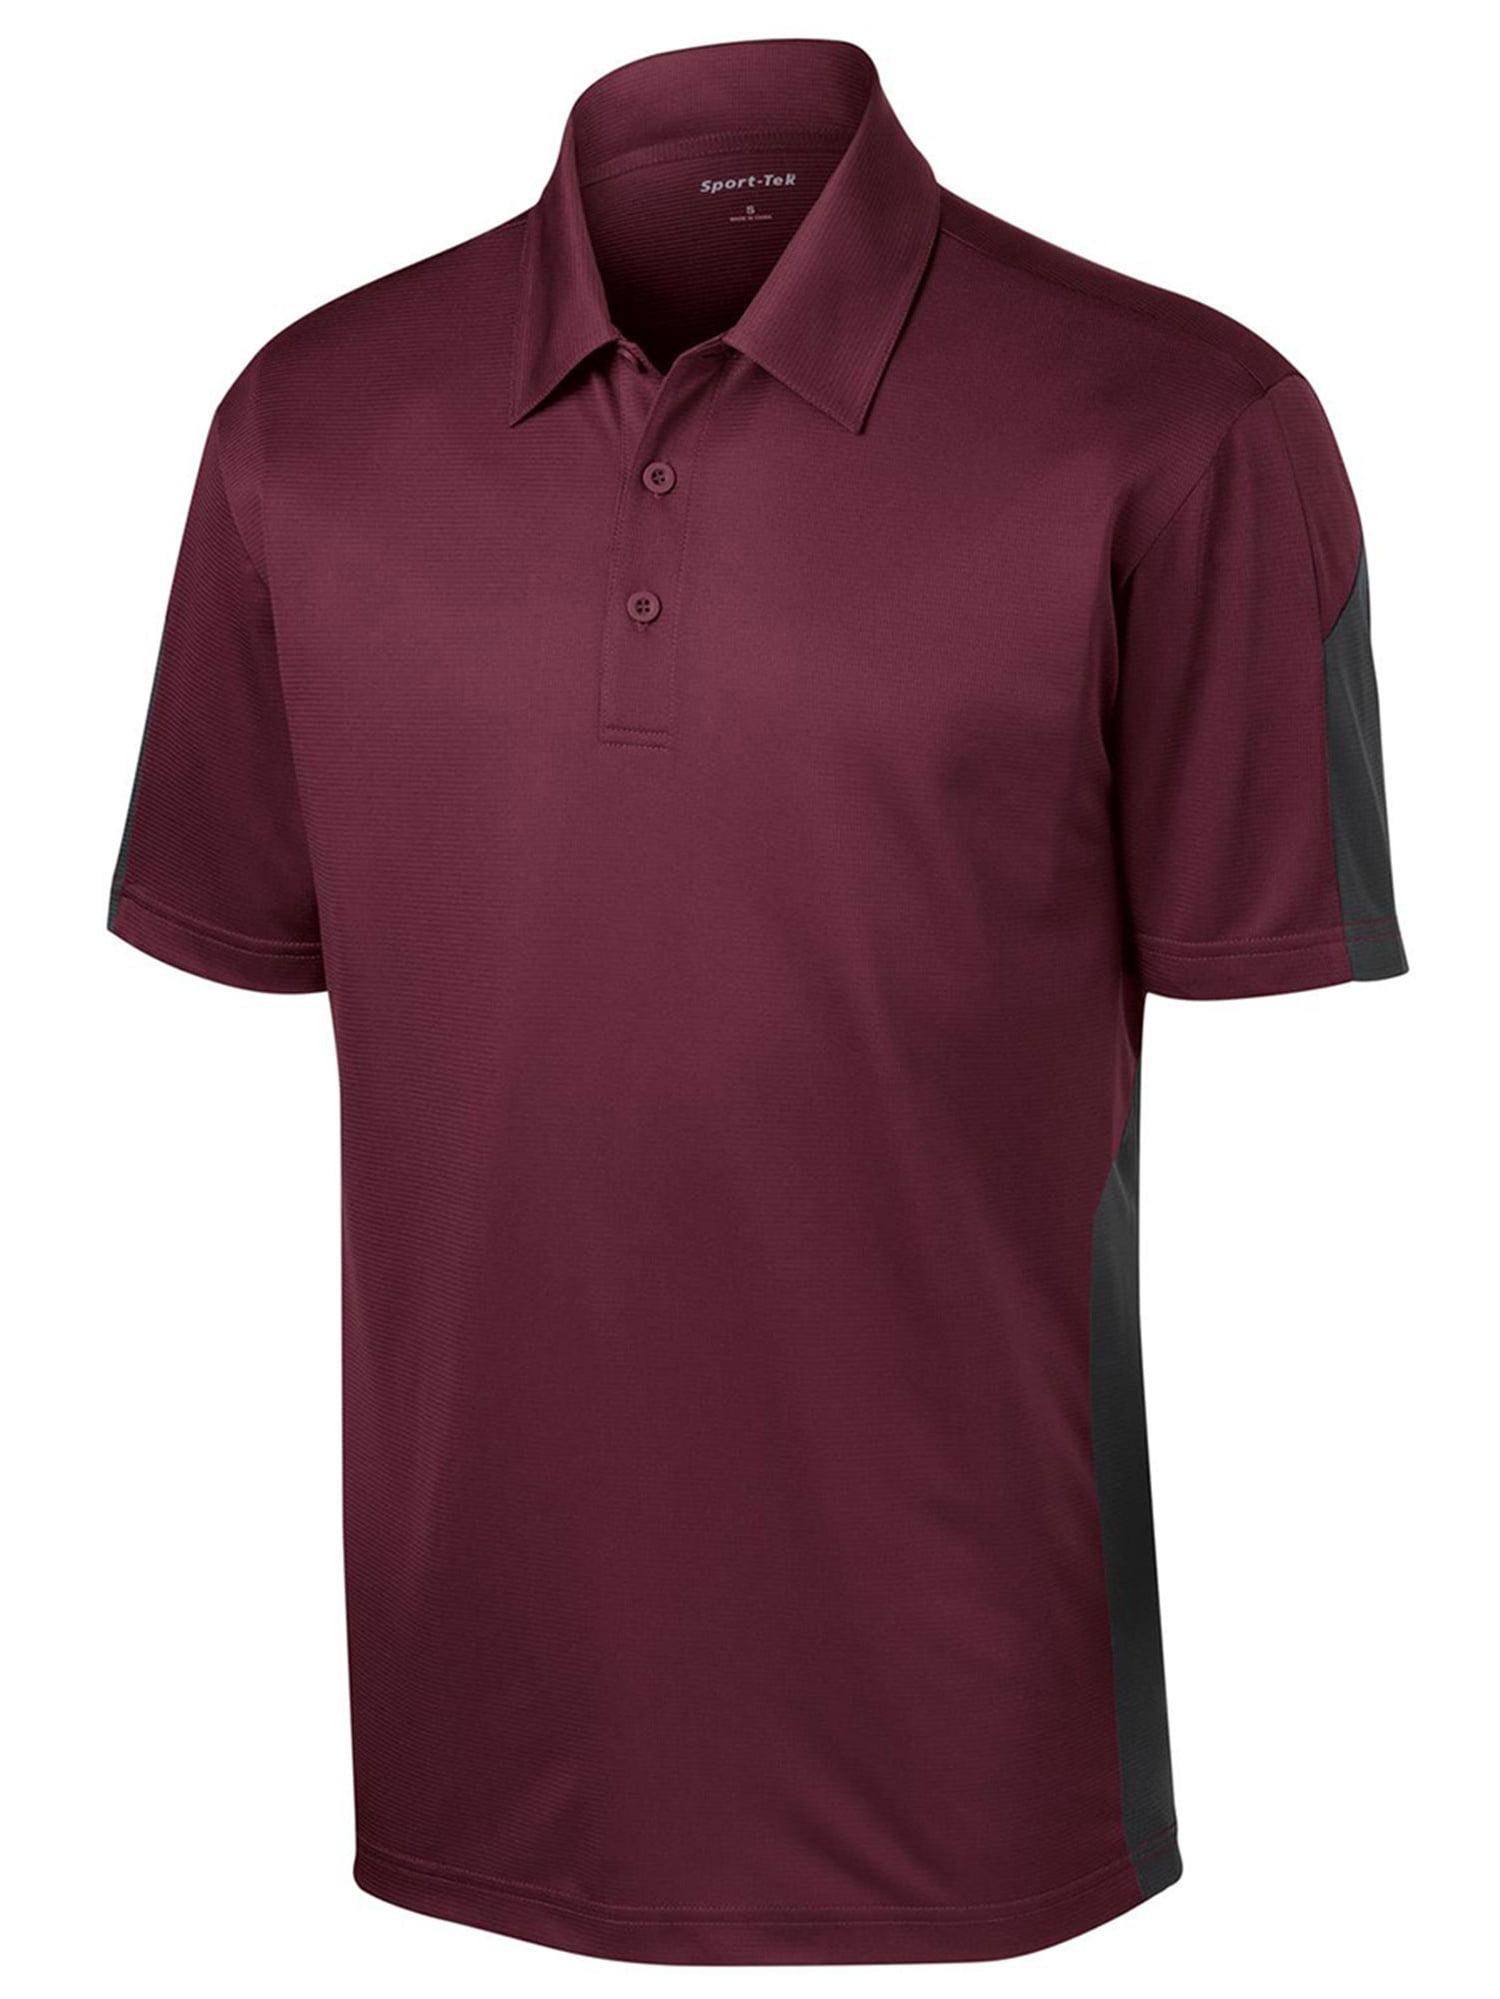 Sport Tek Sport Tek Mens Textured Moisture Wicking Polo Shirt